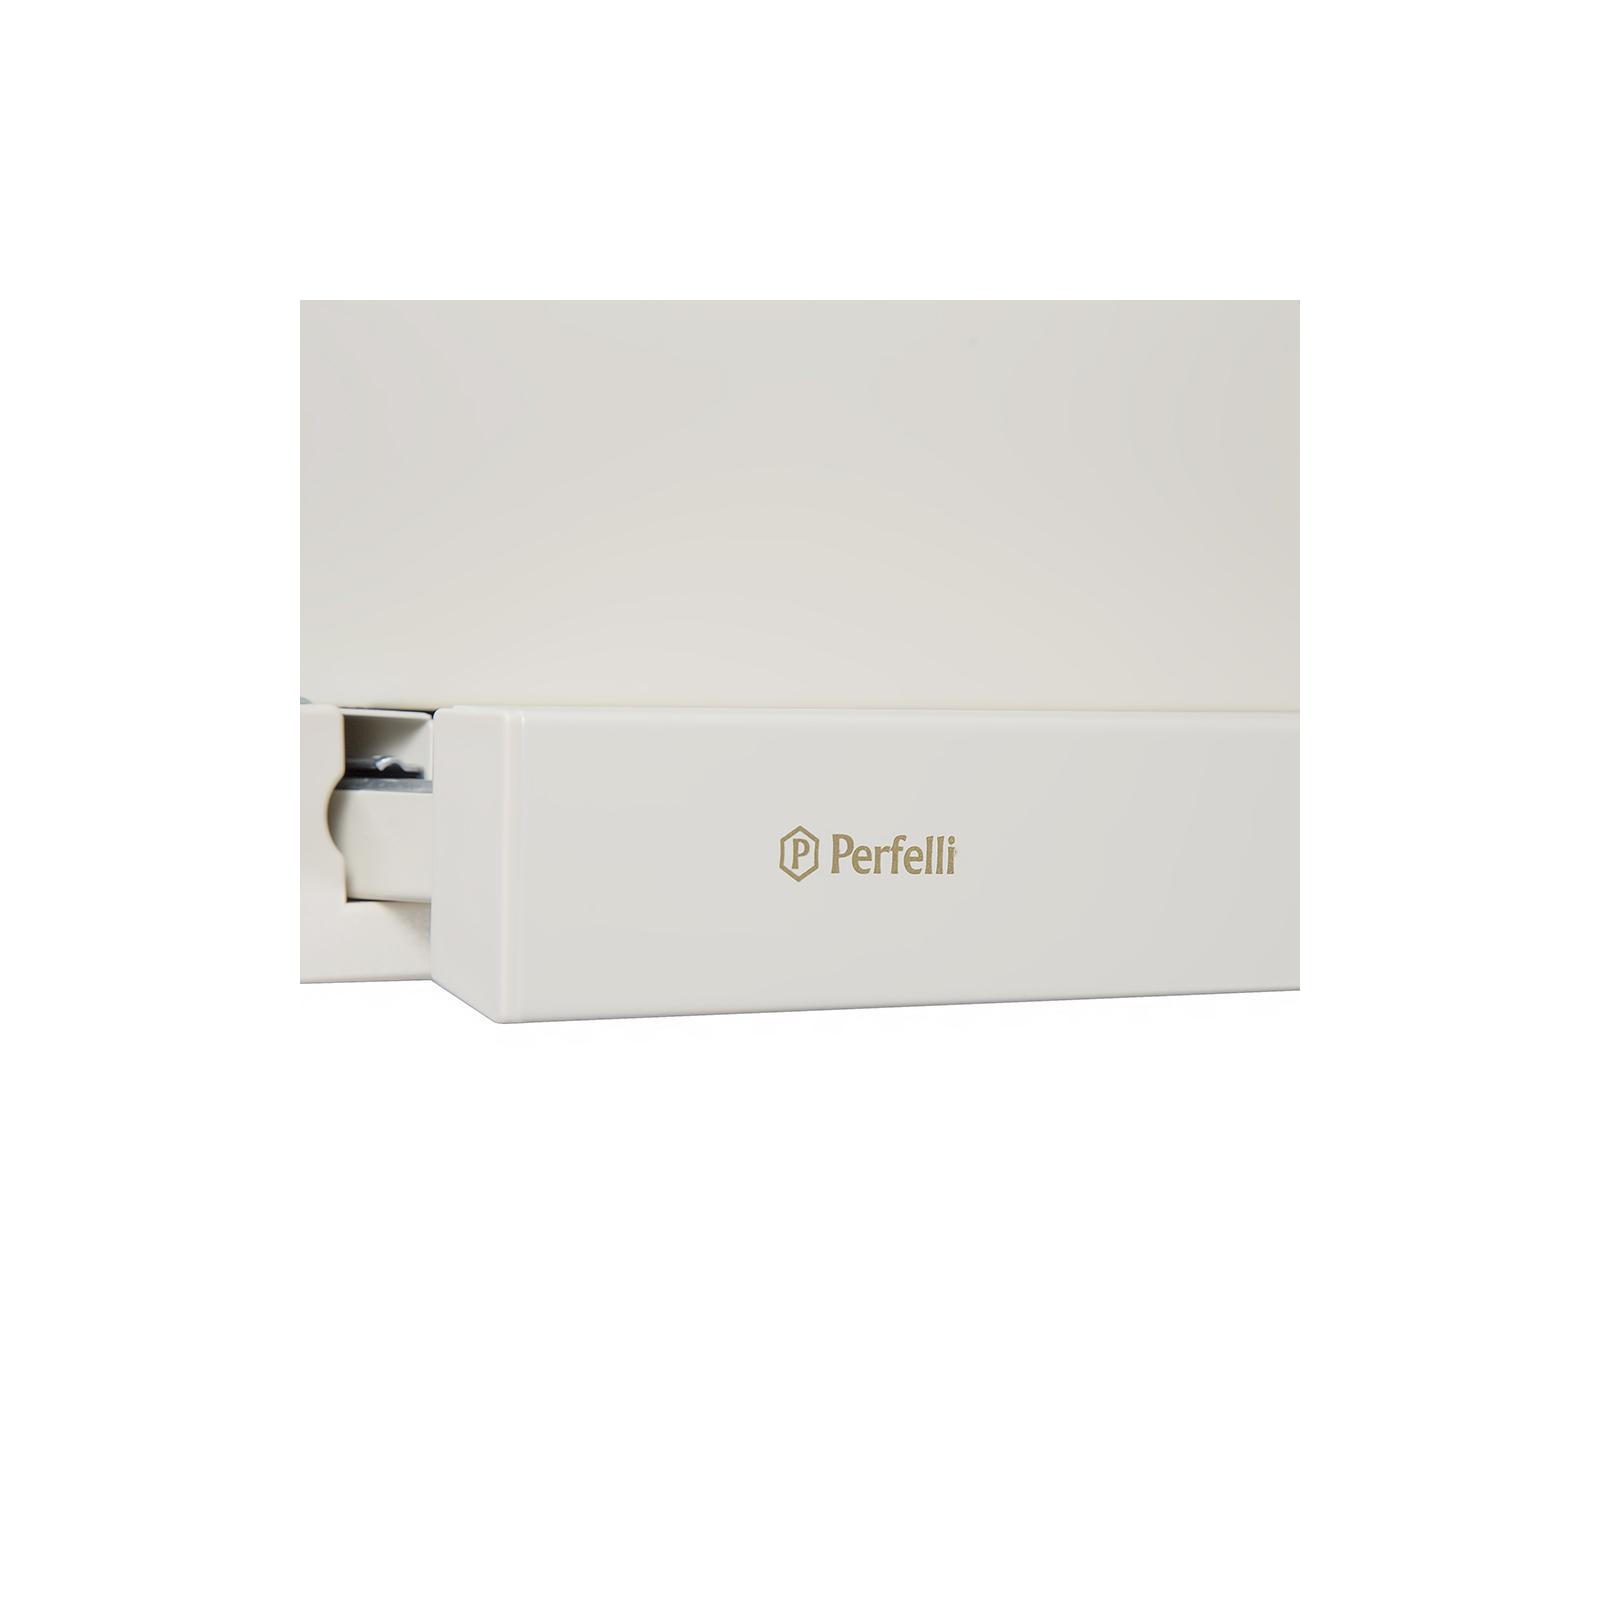 Вытяжка кухонная Perfelli TL 6112 IV LED изображение 5